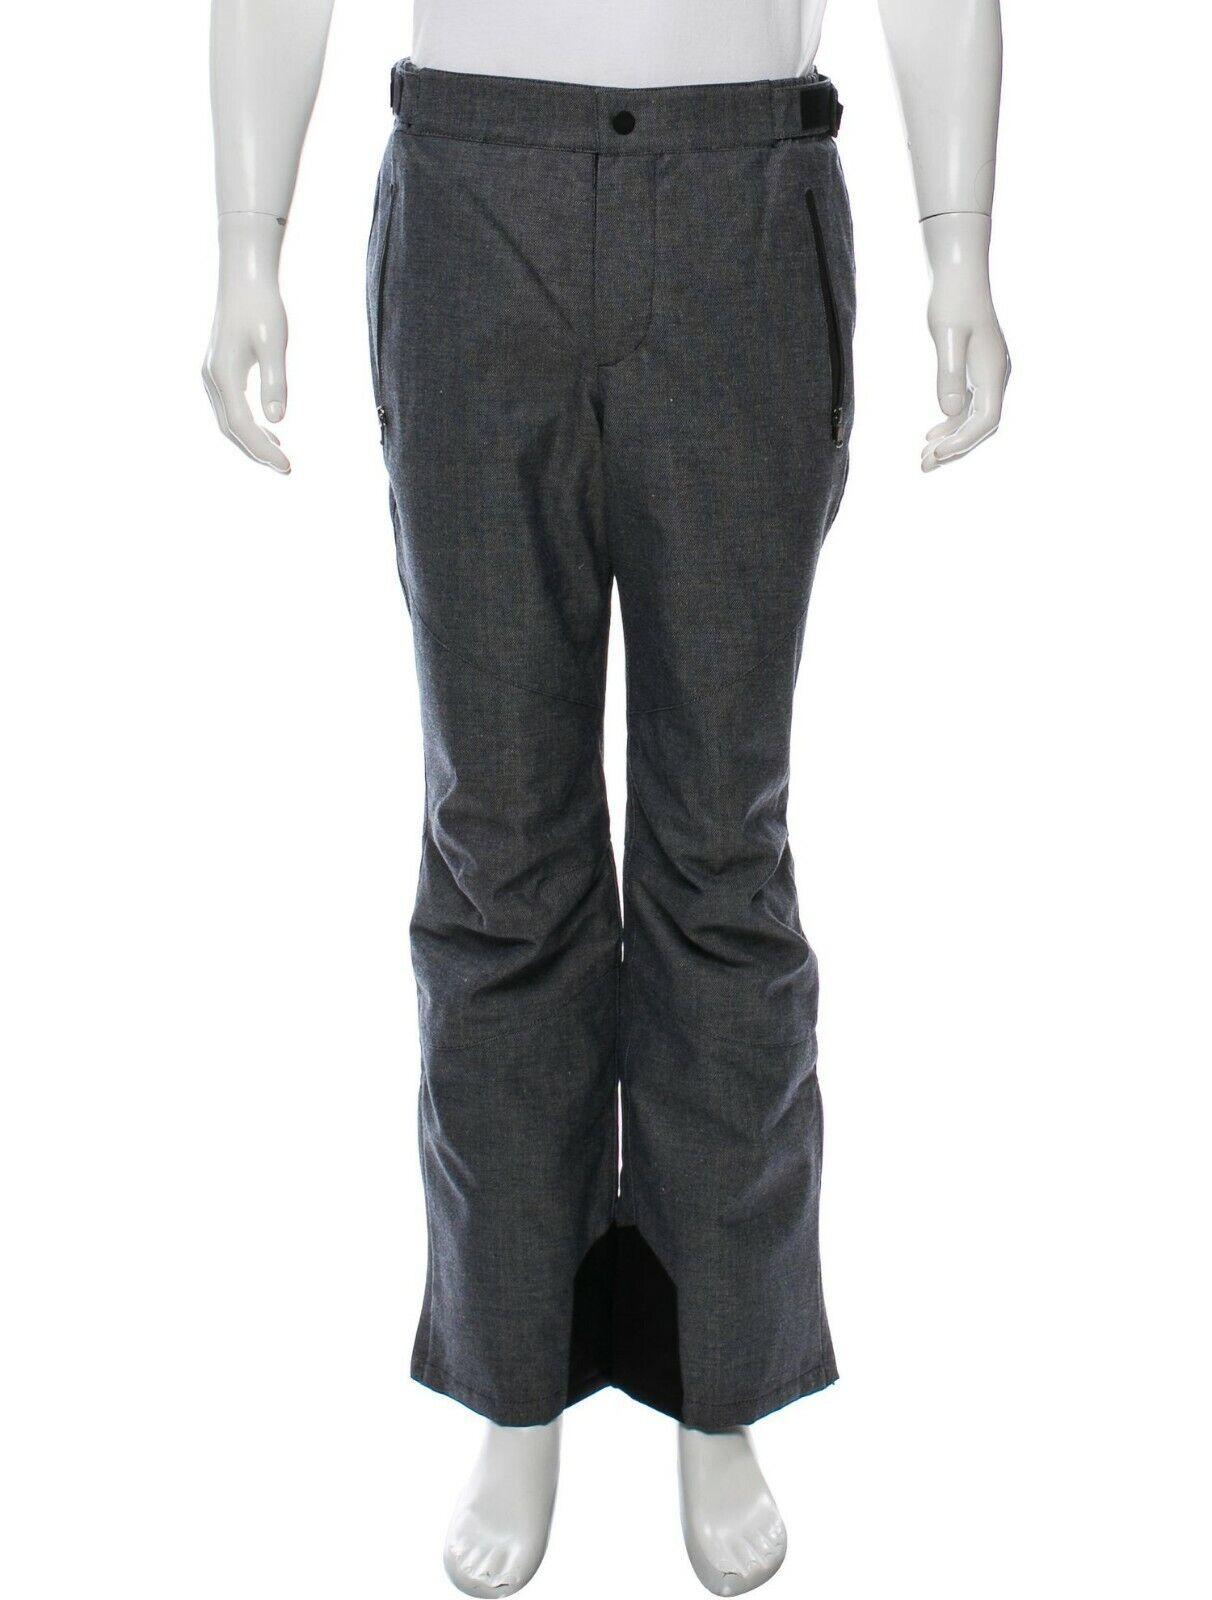 NEW Emporio Armani Insulated Ski Pants size M